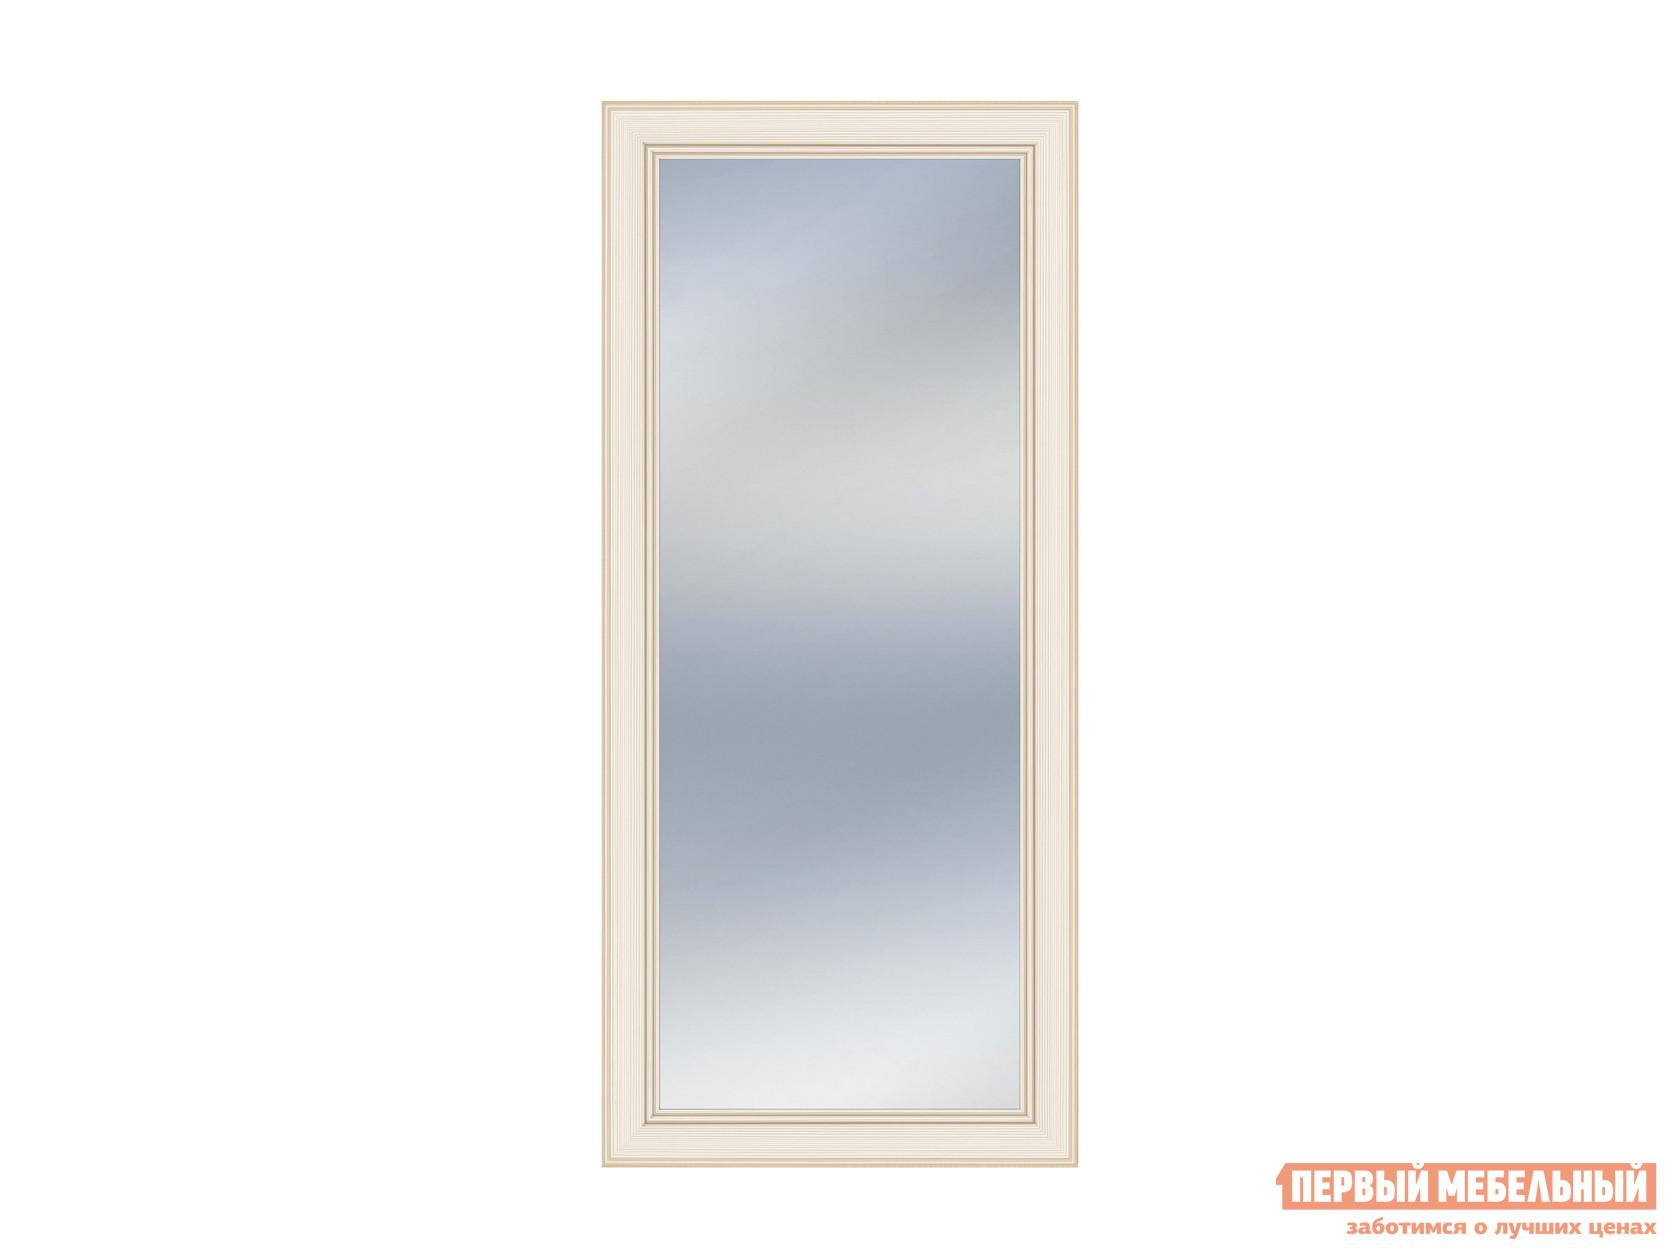 Настенное зеркало  Зеркало над тумбой Сиена Бодега белый, патина золото